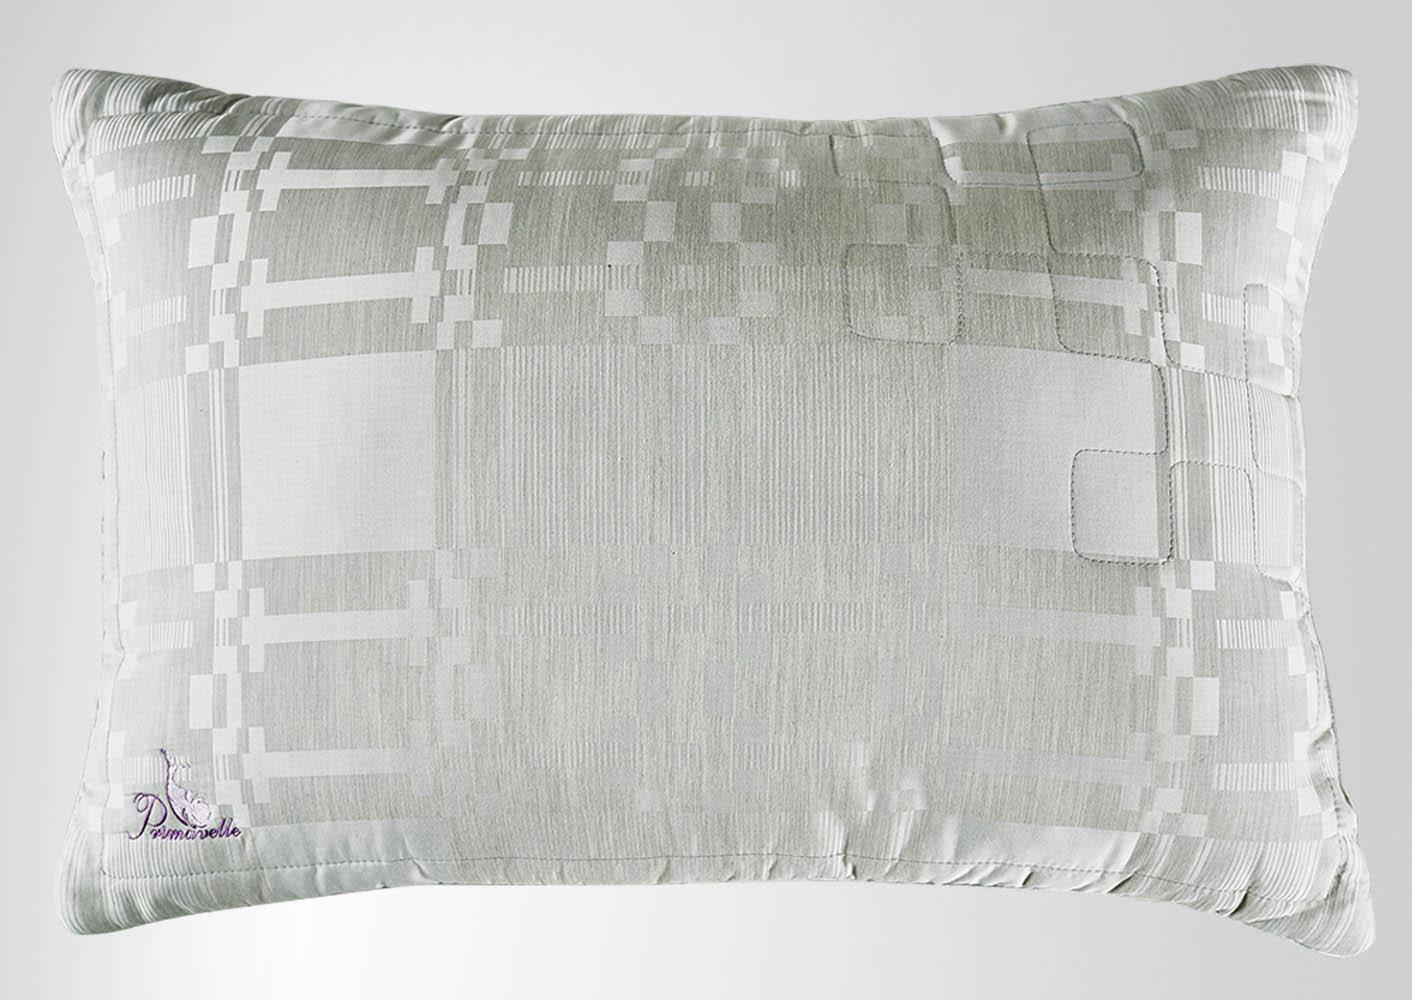 Купить Подушки Primavelle, Подушка Lino Цвет: Светло-Серый (50х70), Россия, Тенсел (эвкалипт)